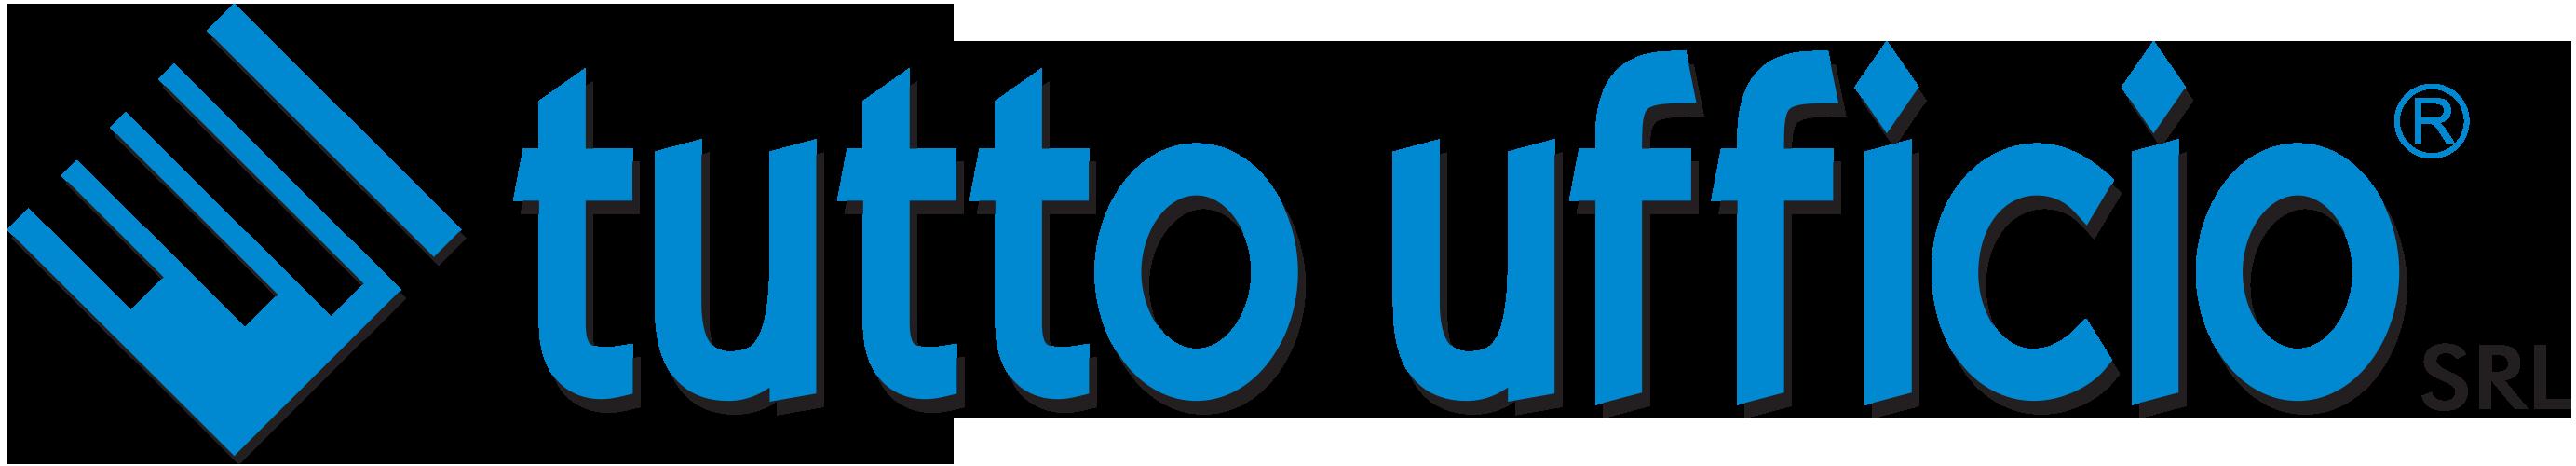 wp-content/uploads/img-loghi16/TuttoUfficioSrl_logo.png